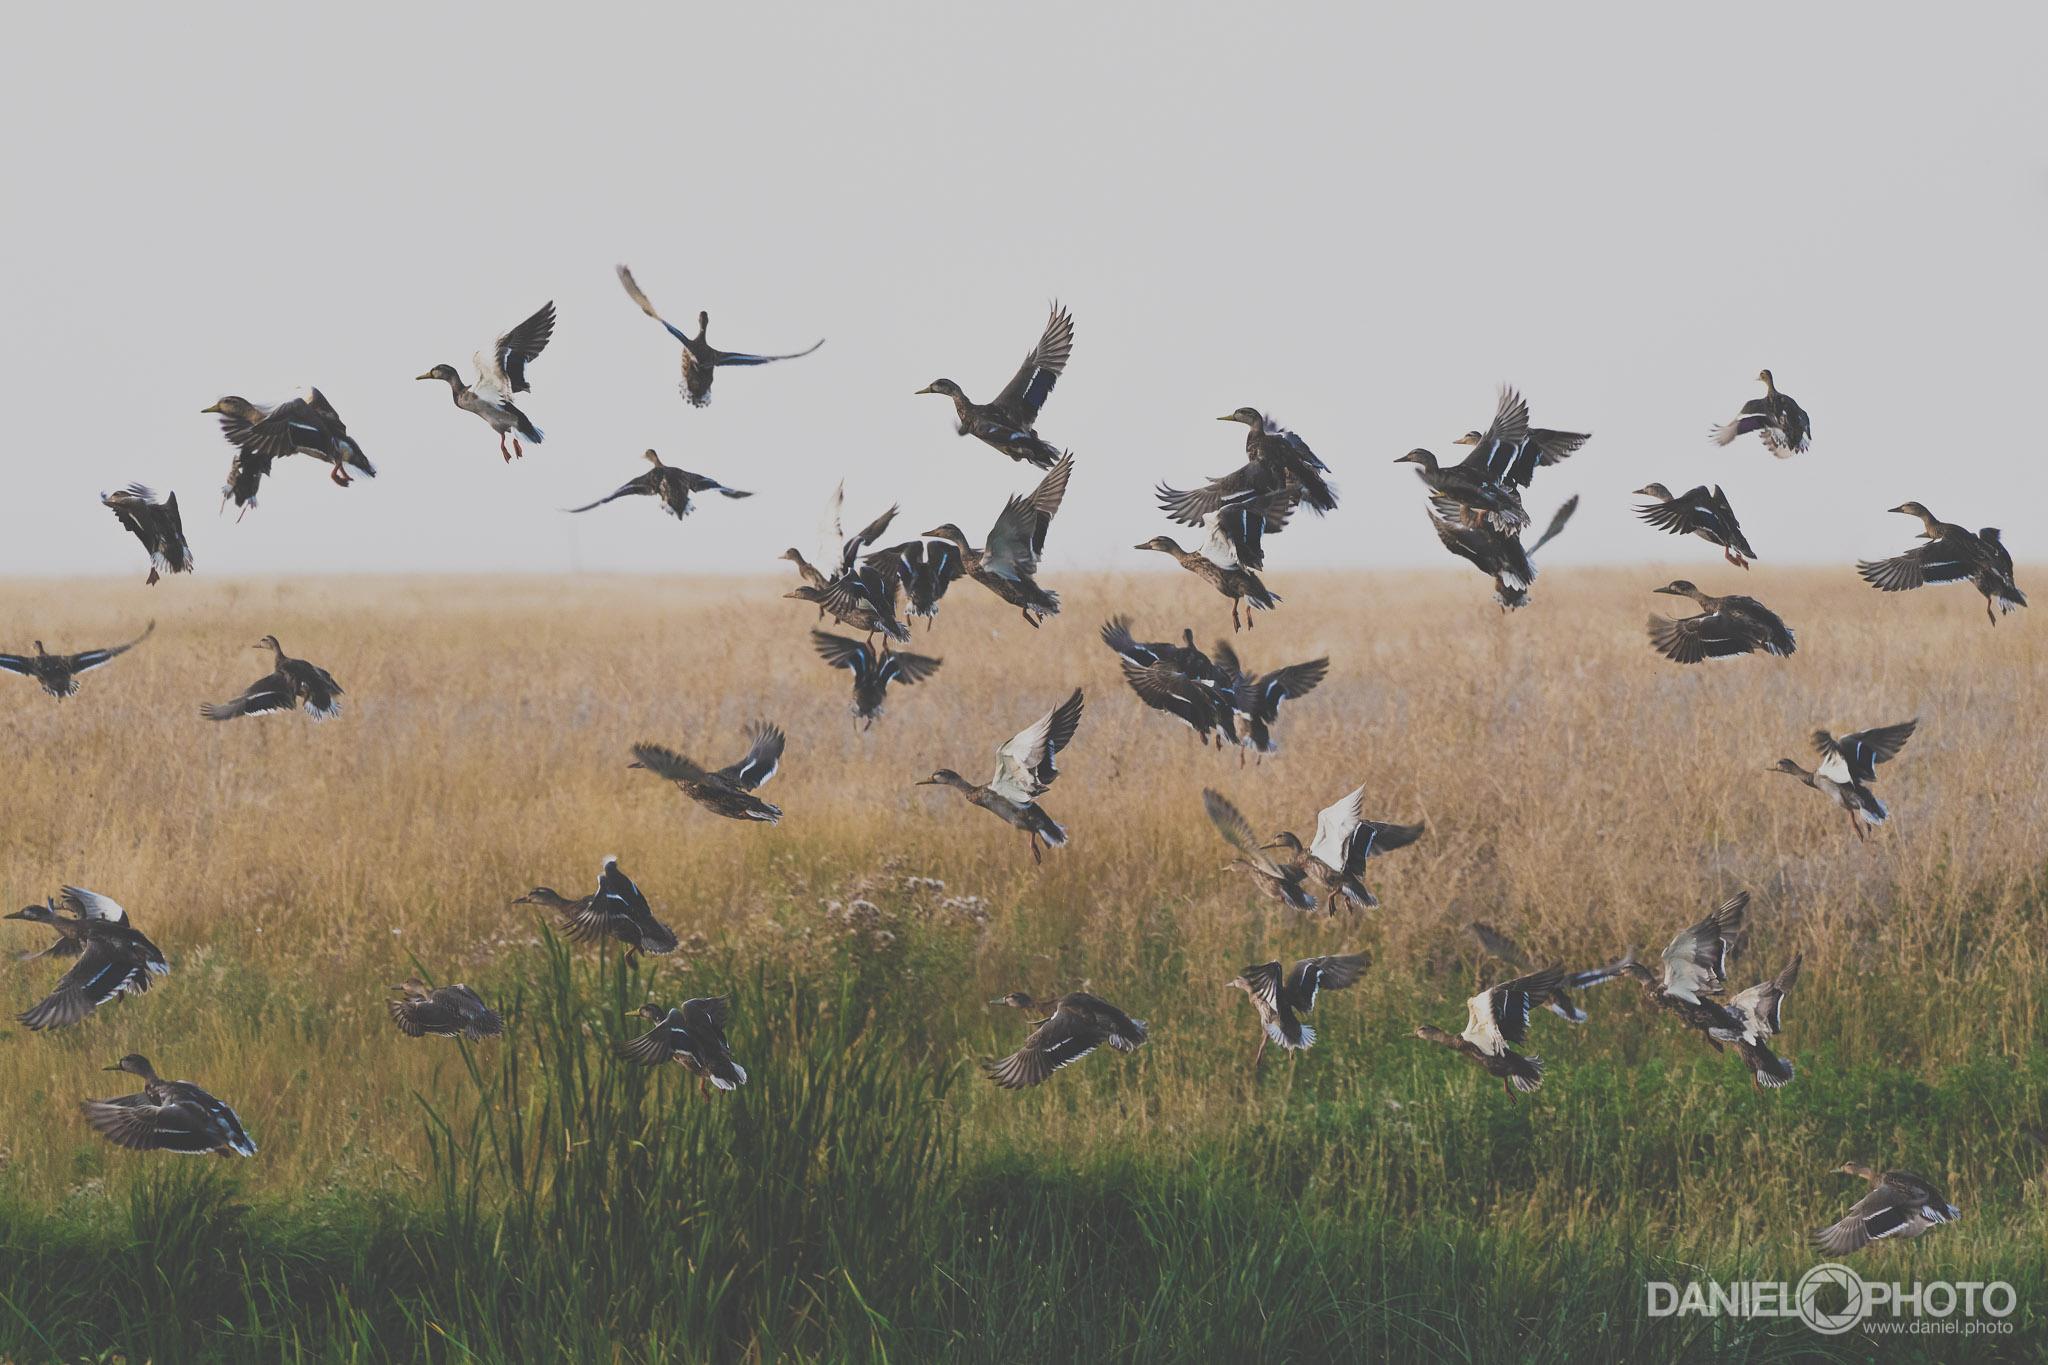 A flock of ducks takes flight.